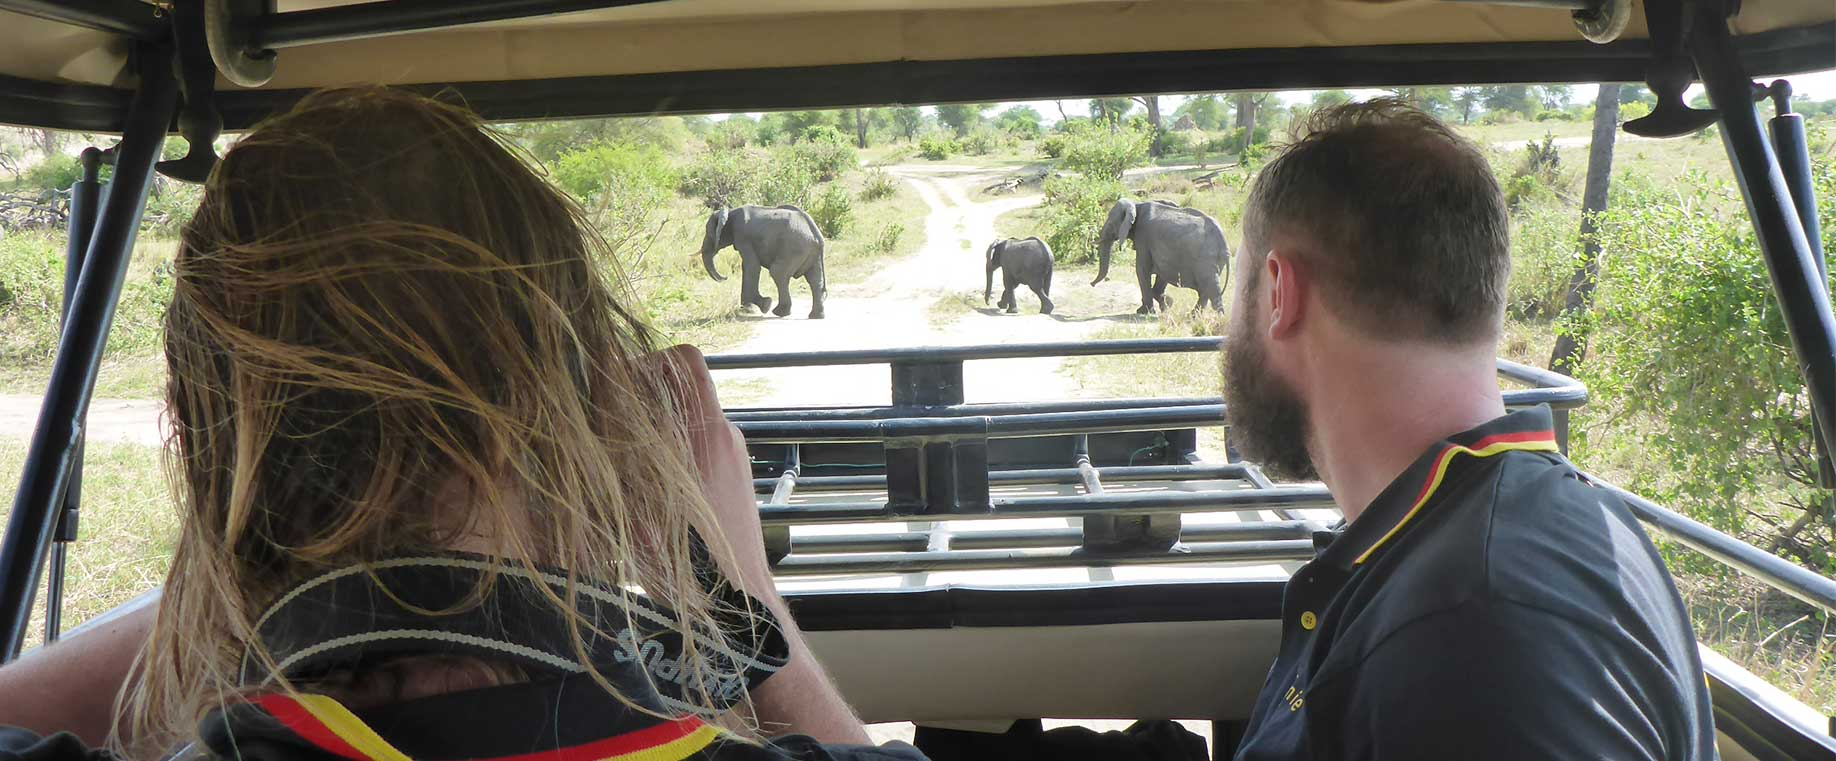 Game viewing - Zorilla Safaris & Treks